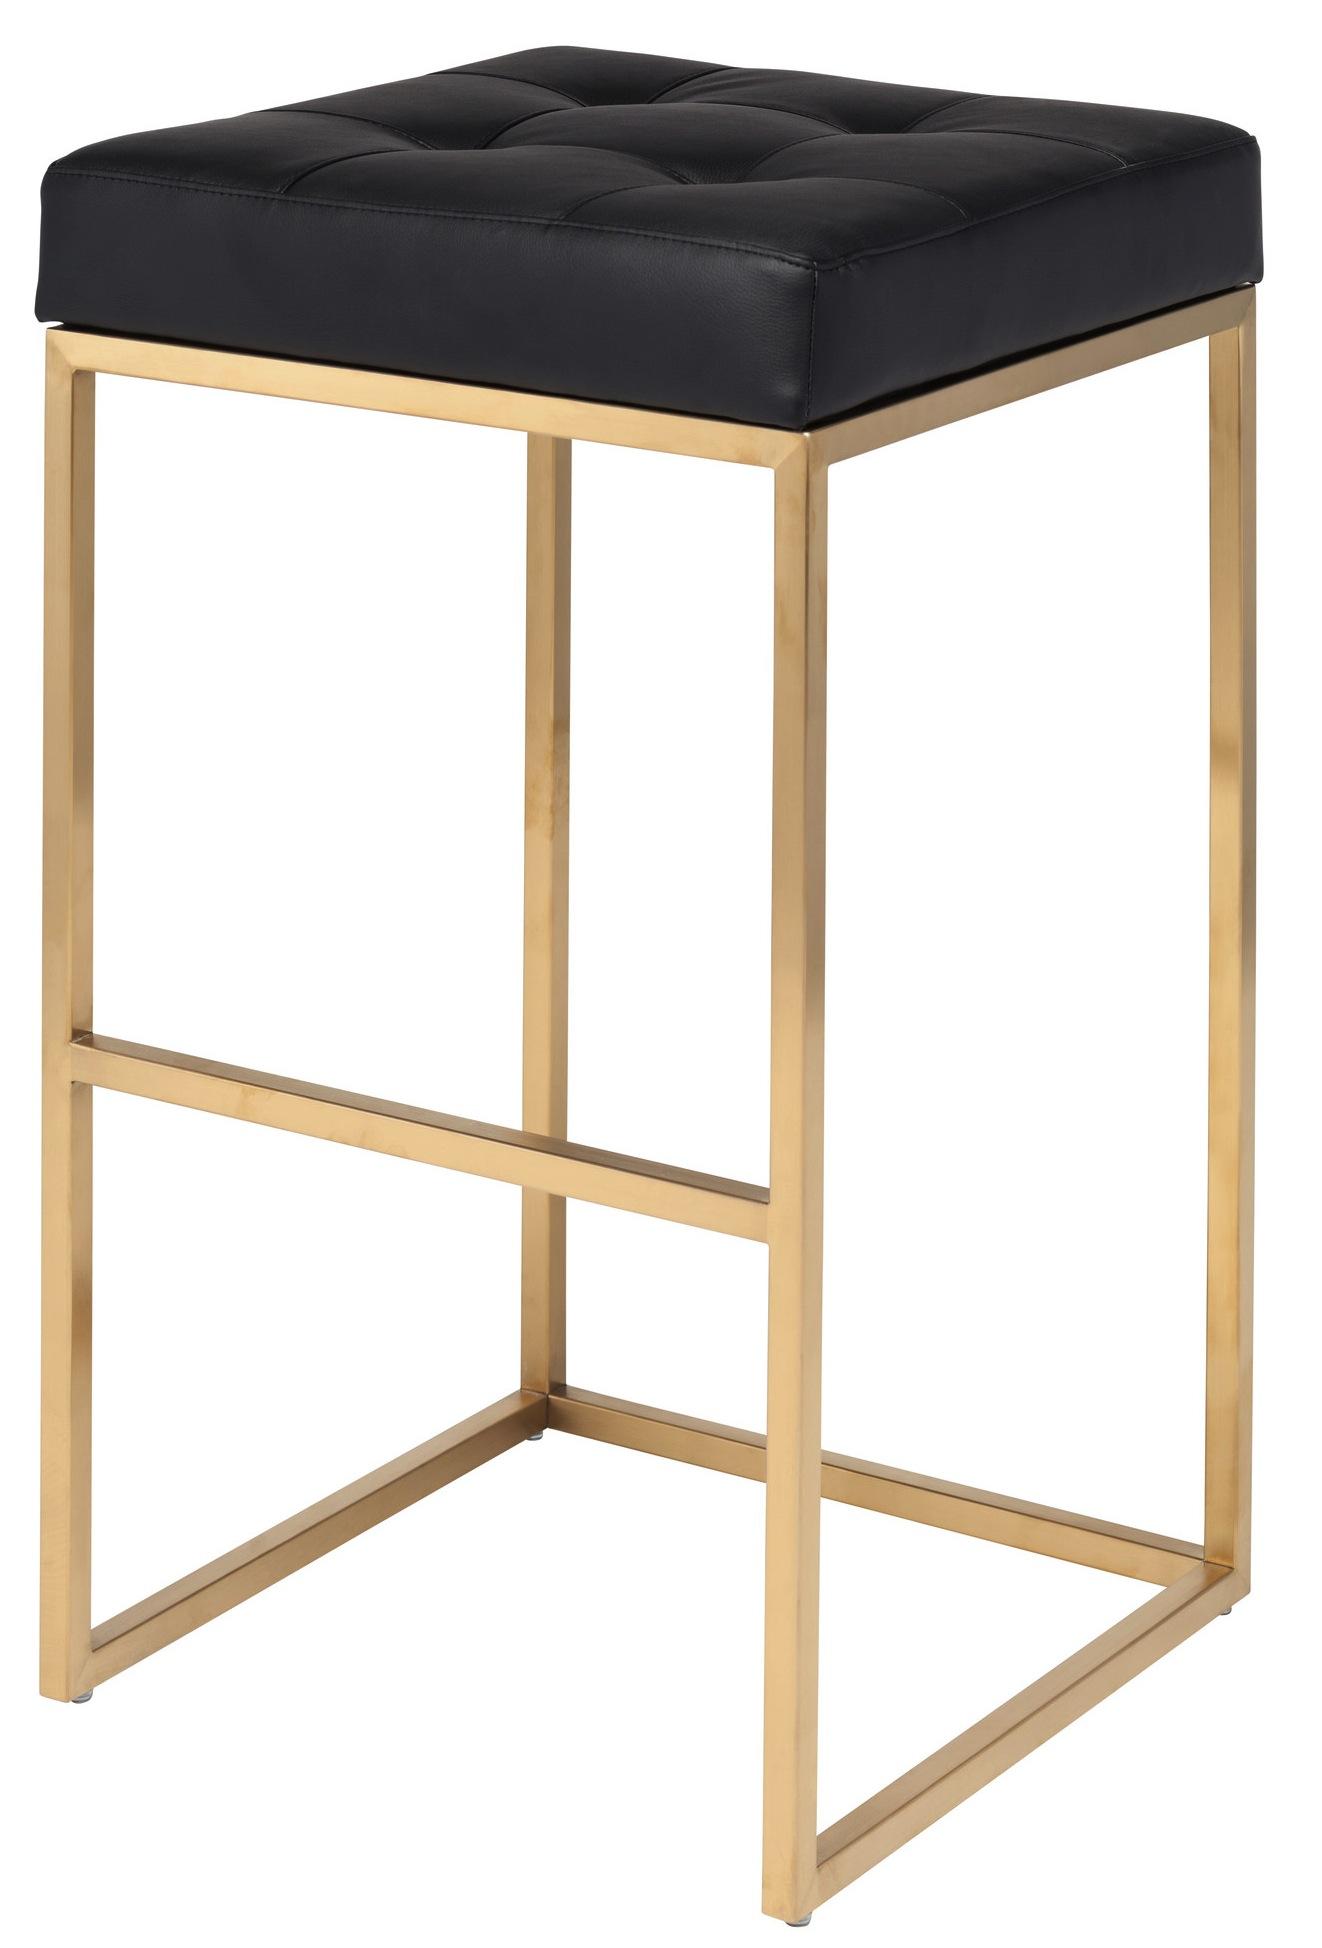 chi-bar-stool-black-with-gold-finish.jpg